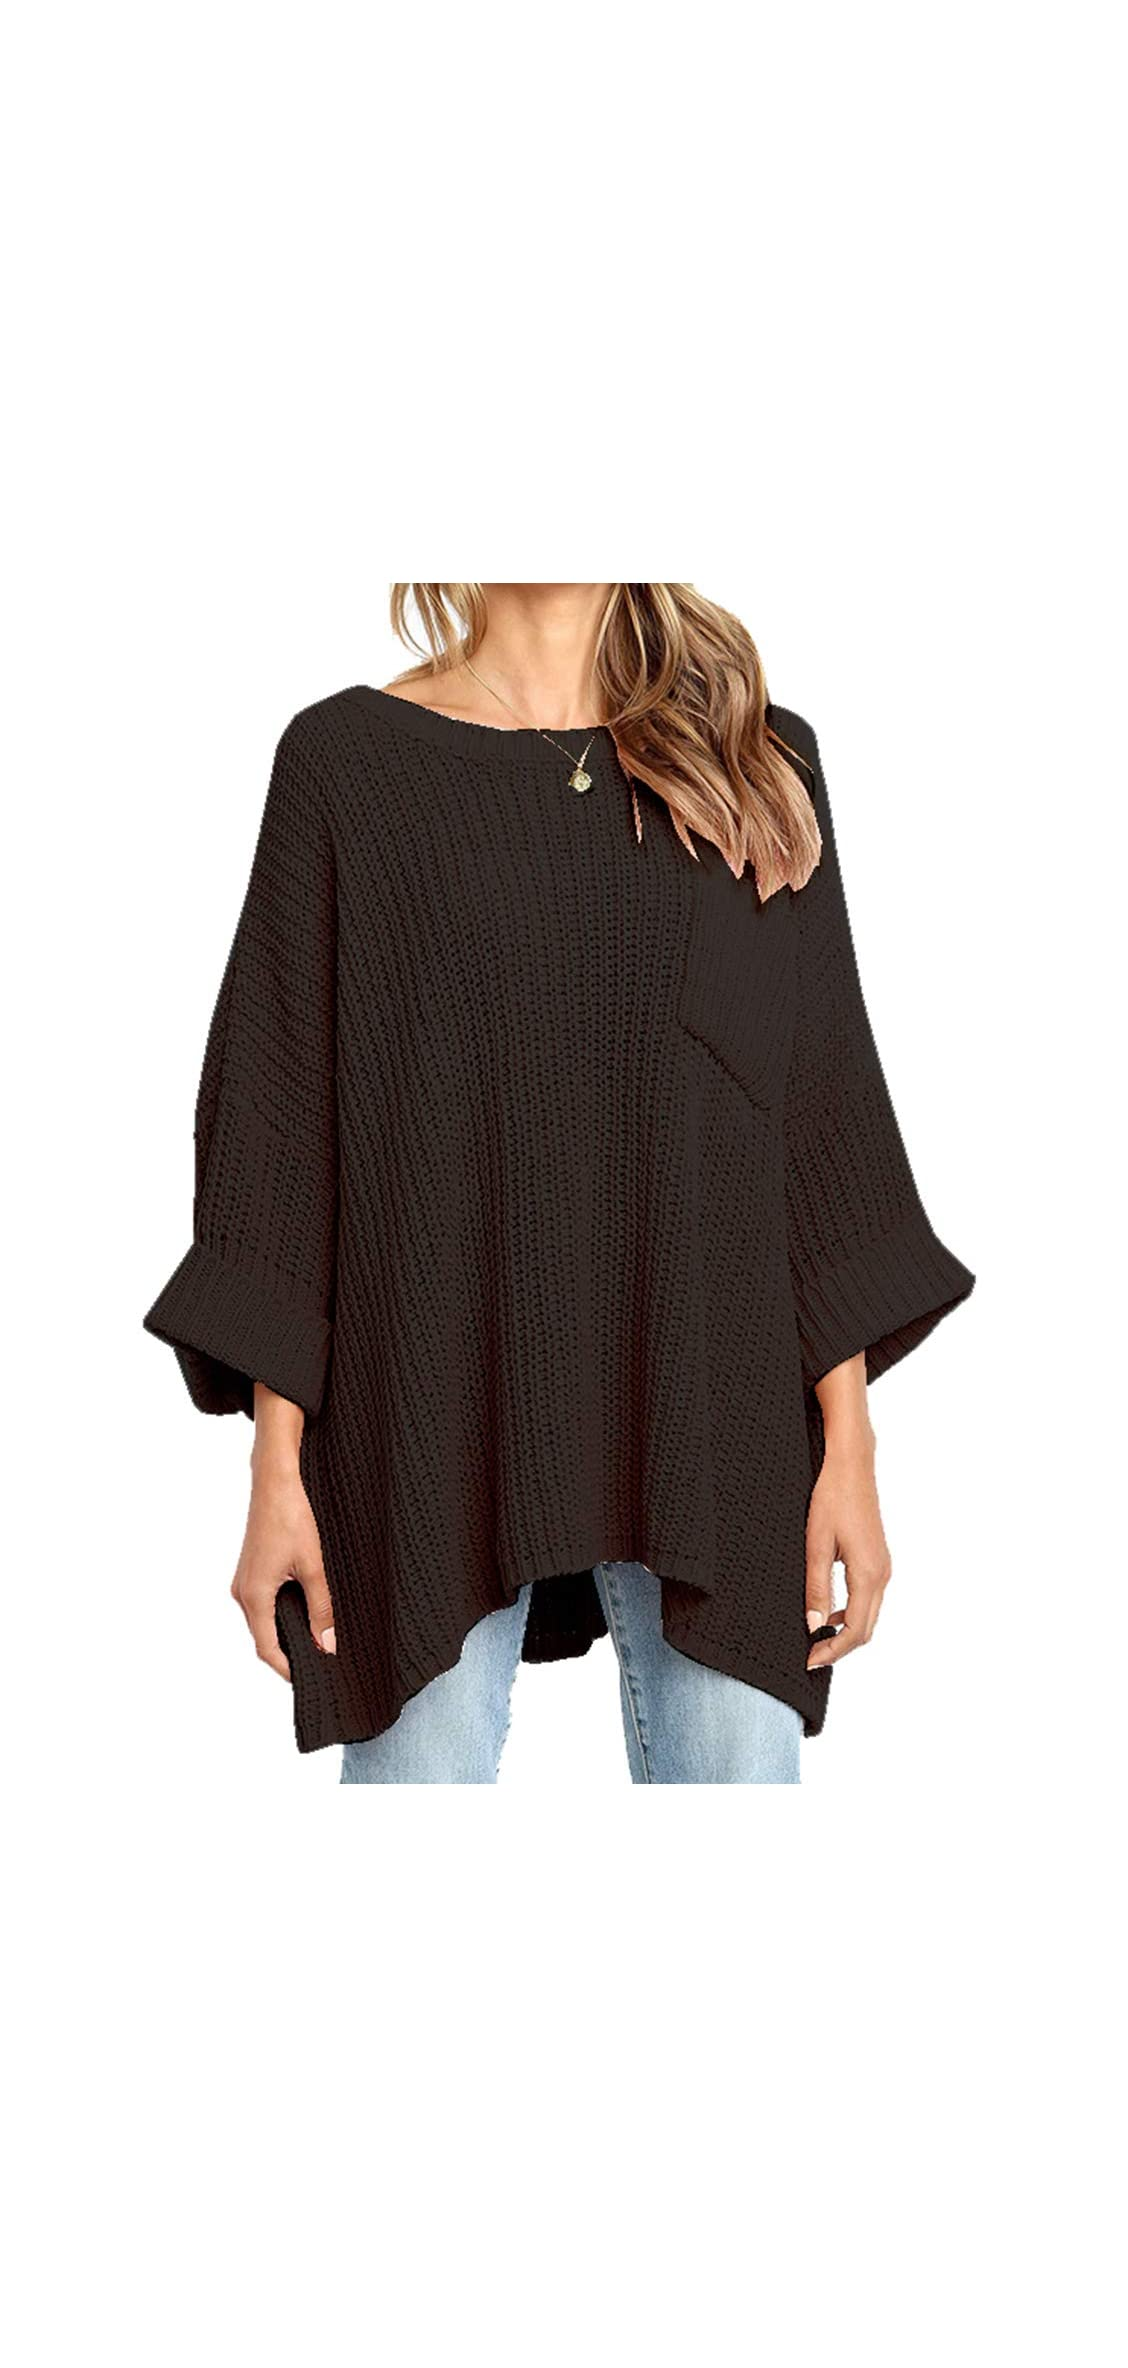 Womens Winter Long Knitted Sweater Dress Off Shoulder